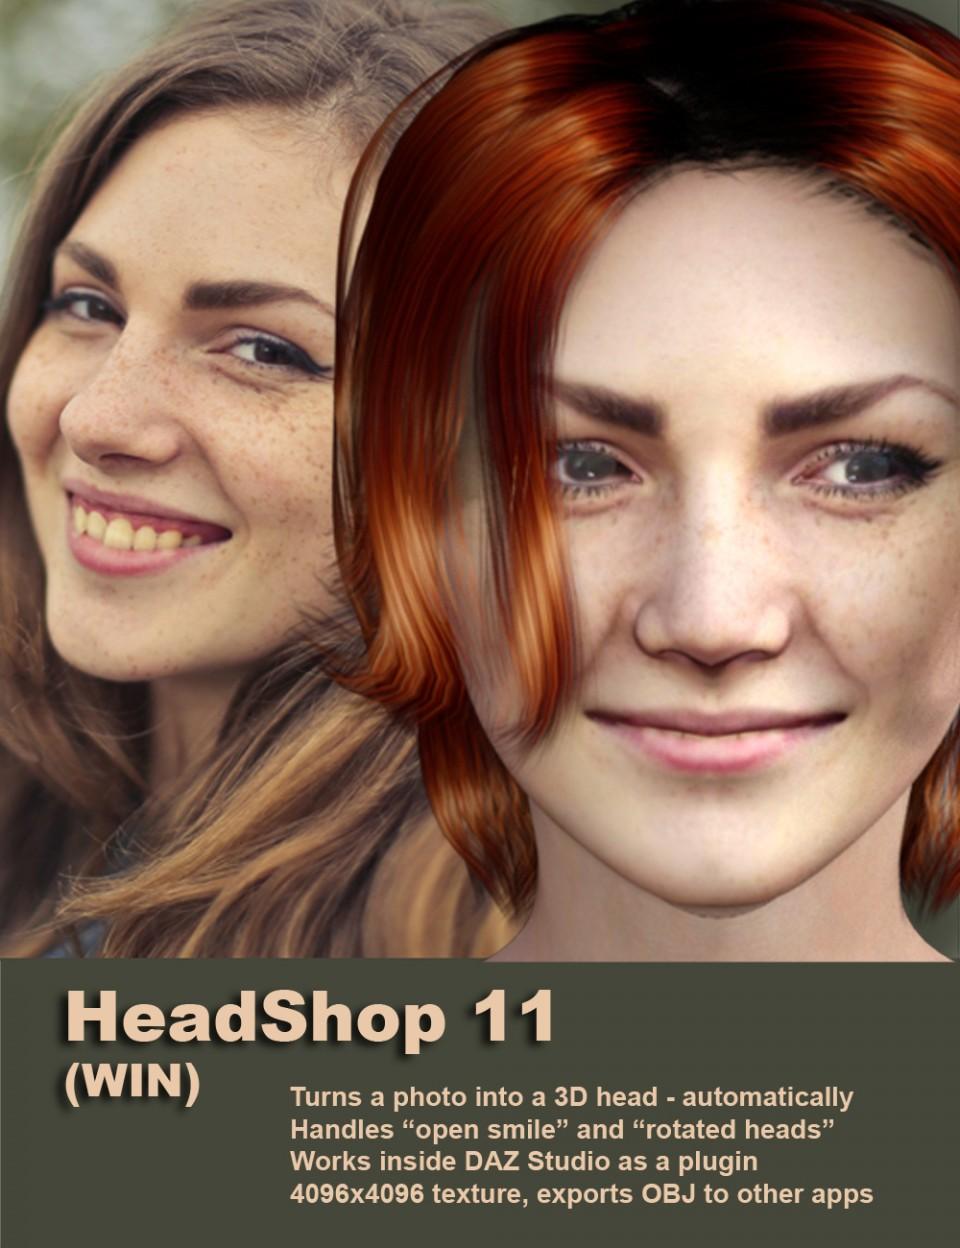 HeadShop 11 WIN